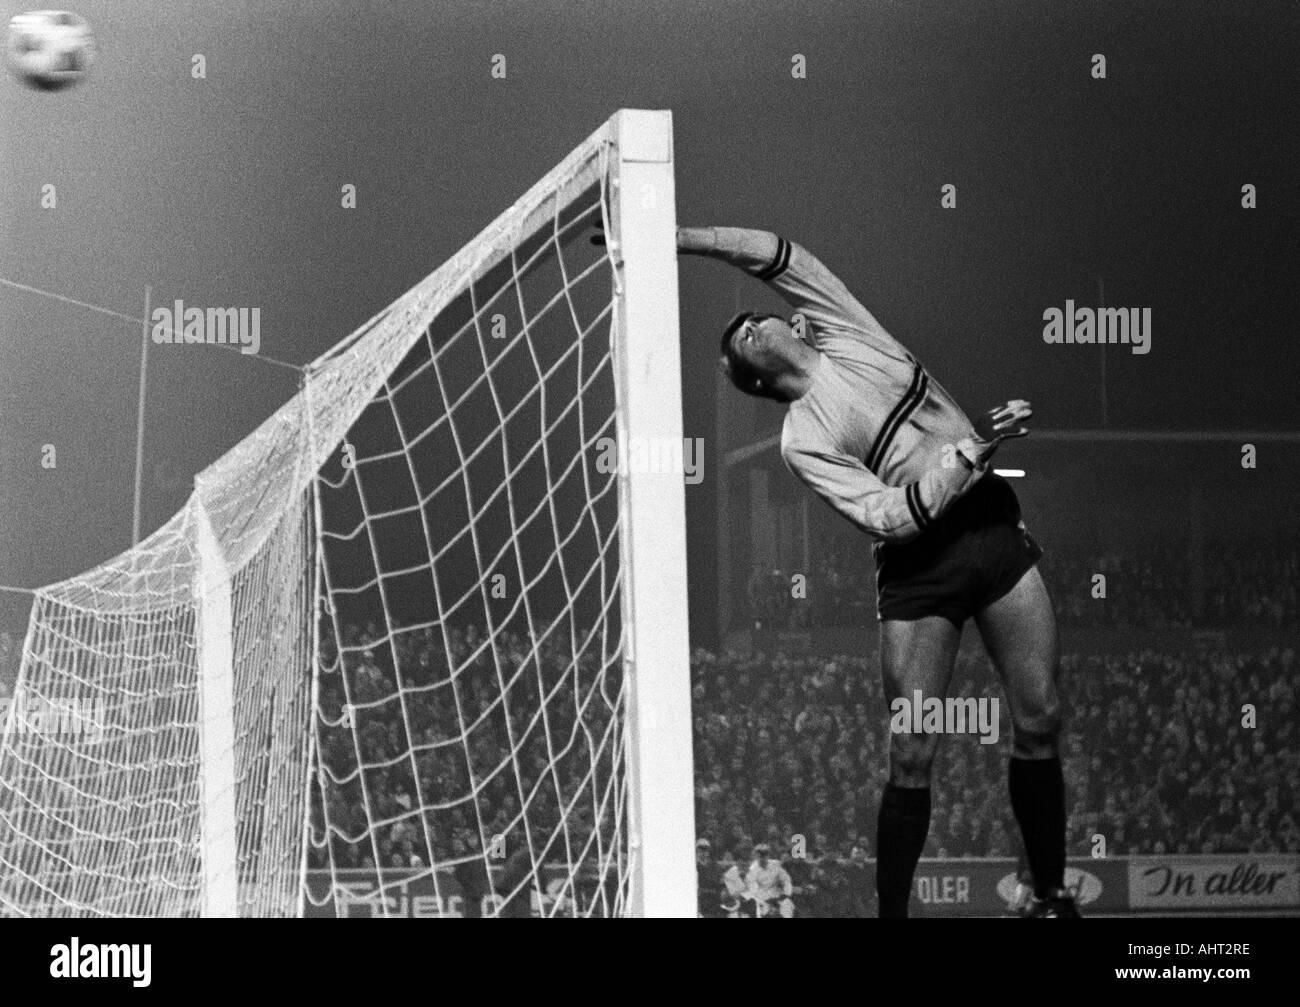 football, Bundesliga, 1970/1971, Niederrhein Stadium in Oberhausen, Rot-Weiss Oberhausen versus FC Bayern Munich 0:4, scene of the match, ball misses the goal, no danger to keeper Wolfgang Scheid (OB) - Stock Image